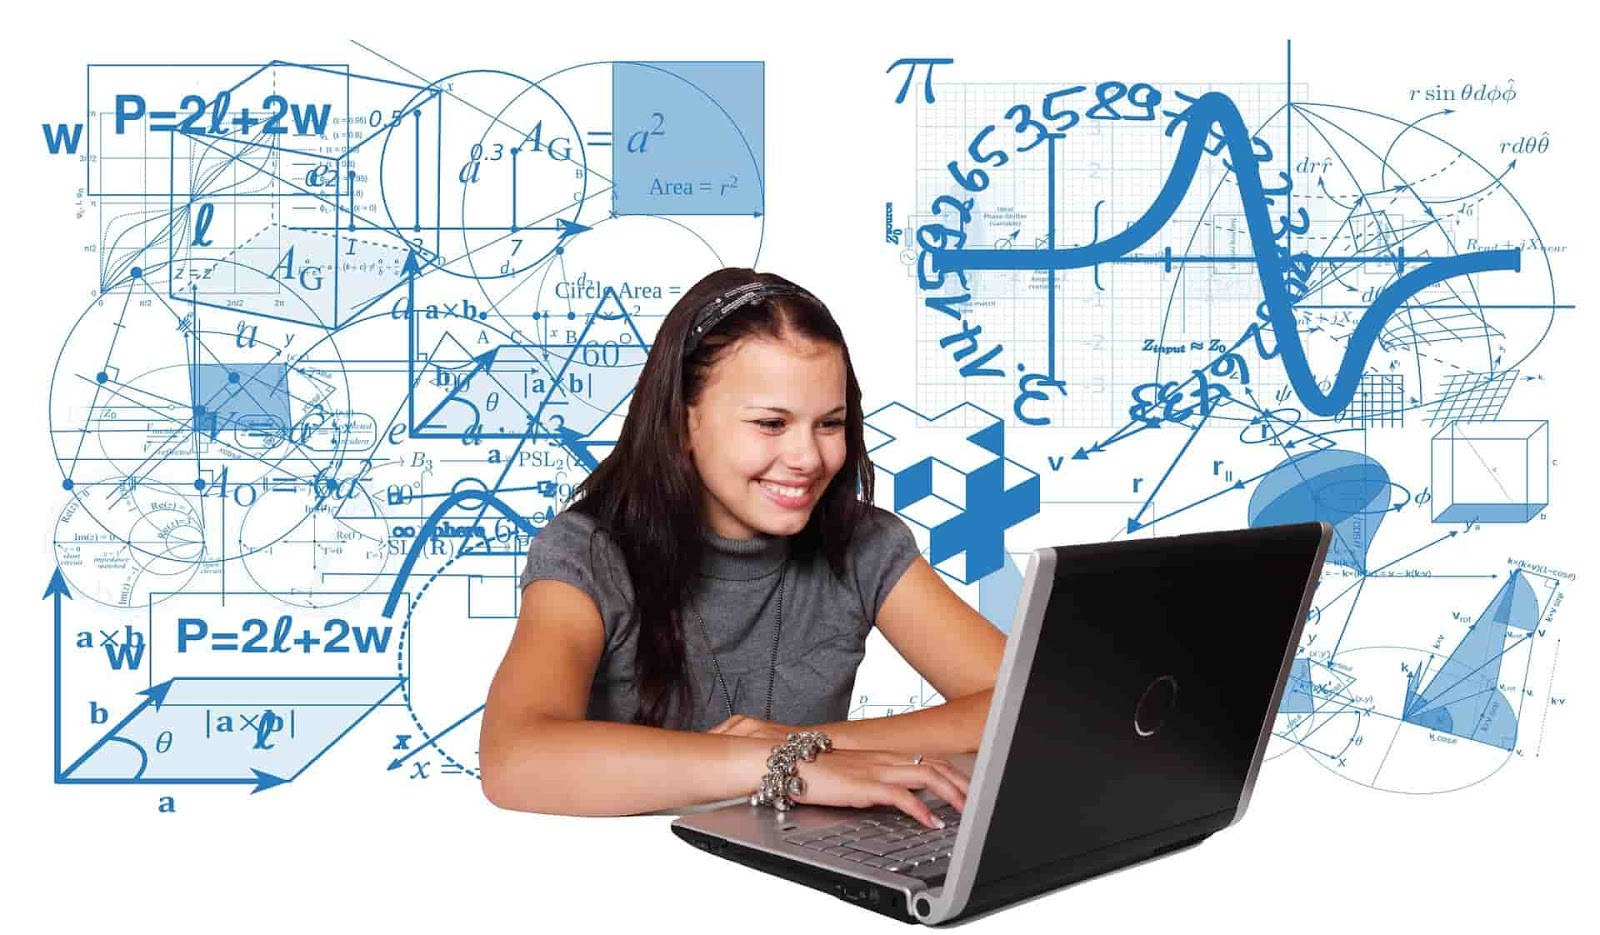 nata-candidate-id, sample-paper-nata, design-entrance-exams, common-entrance-examination-for-design, design-aptitude-test-sample-papers,,aieee-architecture, architecture-gk-questions, bfa-entrance-exam-question-paper, nata-exam-question-paper, nata-cet, general-knowledge-question-paper-with-answer, professional-drawing-classes-in-dombivli, bfa-question-paper,,nata-architecture, www-nata-in-2020, nata-2020-registration, www-nata-nic-in-2020, nata-login, nata-result, nata-colleges, nata-result-2020, nata-admit-card, nata-question-paper, what-is-nata, nata-mock-test, nata-2018-question-paper, nata-exam-pattern, nata-exam-sample-paper, entrance-exam-for-architecture-after-12th, nata-download, architecture-model-question-papers, find-candidate-id-nata, nata-2020-result-score-card, nata-april-2020-mathematics-syllabus, how-to-download-nata-application-form-2020, nata-exam-date-2020, nata-2018-topper-list, nata-course-fee, b.arch-merit-list-2020, nata-full-form-in-english age-limit-for-architecture, full-form-of-nata, council-of-architecture-eligibility-criteria, nata-mathematics-algebra, nata-2020-books, nata-toppers-2020, nata-first-attempt-result-2020, nata-question-paper-2020, nata-question-paper-2018-pdf-download, nata-question-papers-with-solution-free-download, nata-question-paper-pattern, nata-question-paper-2017-pdf-download, nata-2018-question-paper-download, nata-2017-question-papers-with-answers-pdf, nata-2018-question-paper-with-answers-pdf, mat-question-papers, neet-exam-sample-paper, nata-online-mock-test-free, aptoinn, nata-drawing-sketches, architecture-aptitude-test-questions, nat-question-paper, nata-preparation-material, nata-paper-2, nata-sample-paper-pdf, nta-free-online-mock-test, nta-b-arch-sample-papers, jee-nata-question-paper, nata-study-material-2020-pdf, nata-revision, nata-drawing-questions-2018,